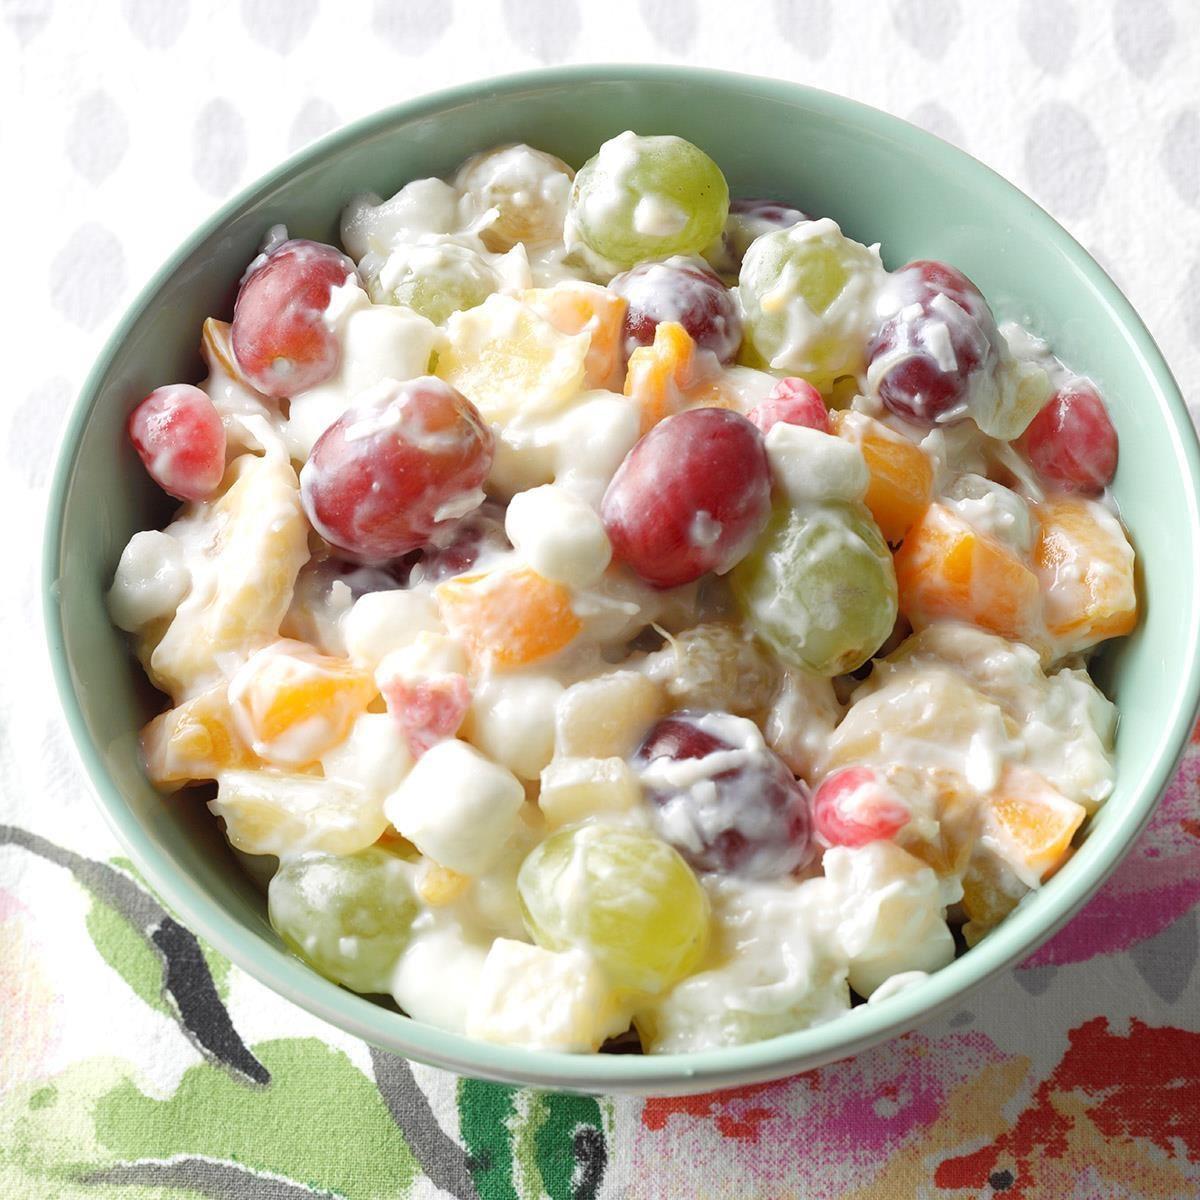 Idaho: Quick Ambrosia Fruit Salad